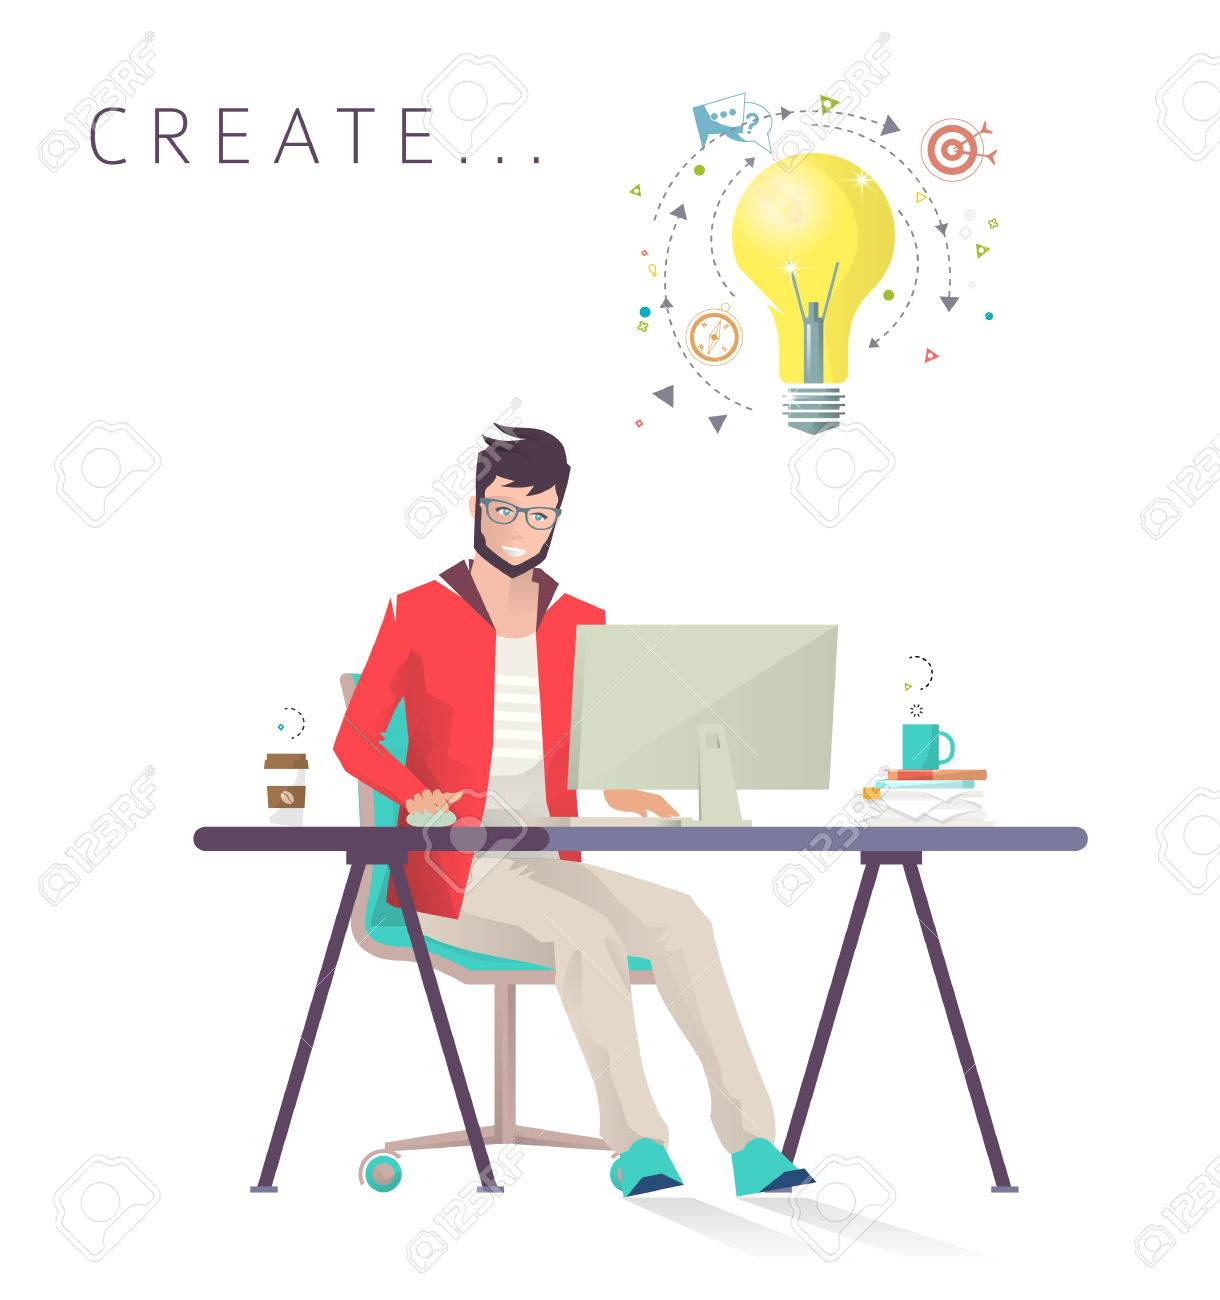 Man works on computer. Designer. Creative process. Business, office work, workplace. Flat design vector illustration. - 74422702